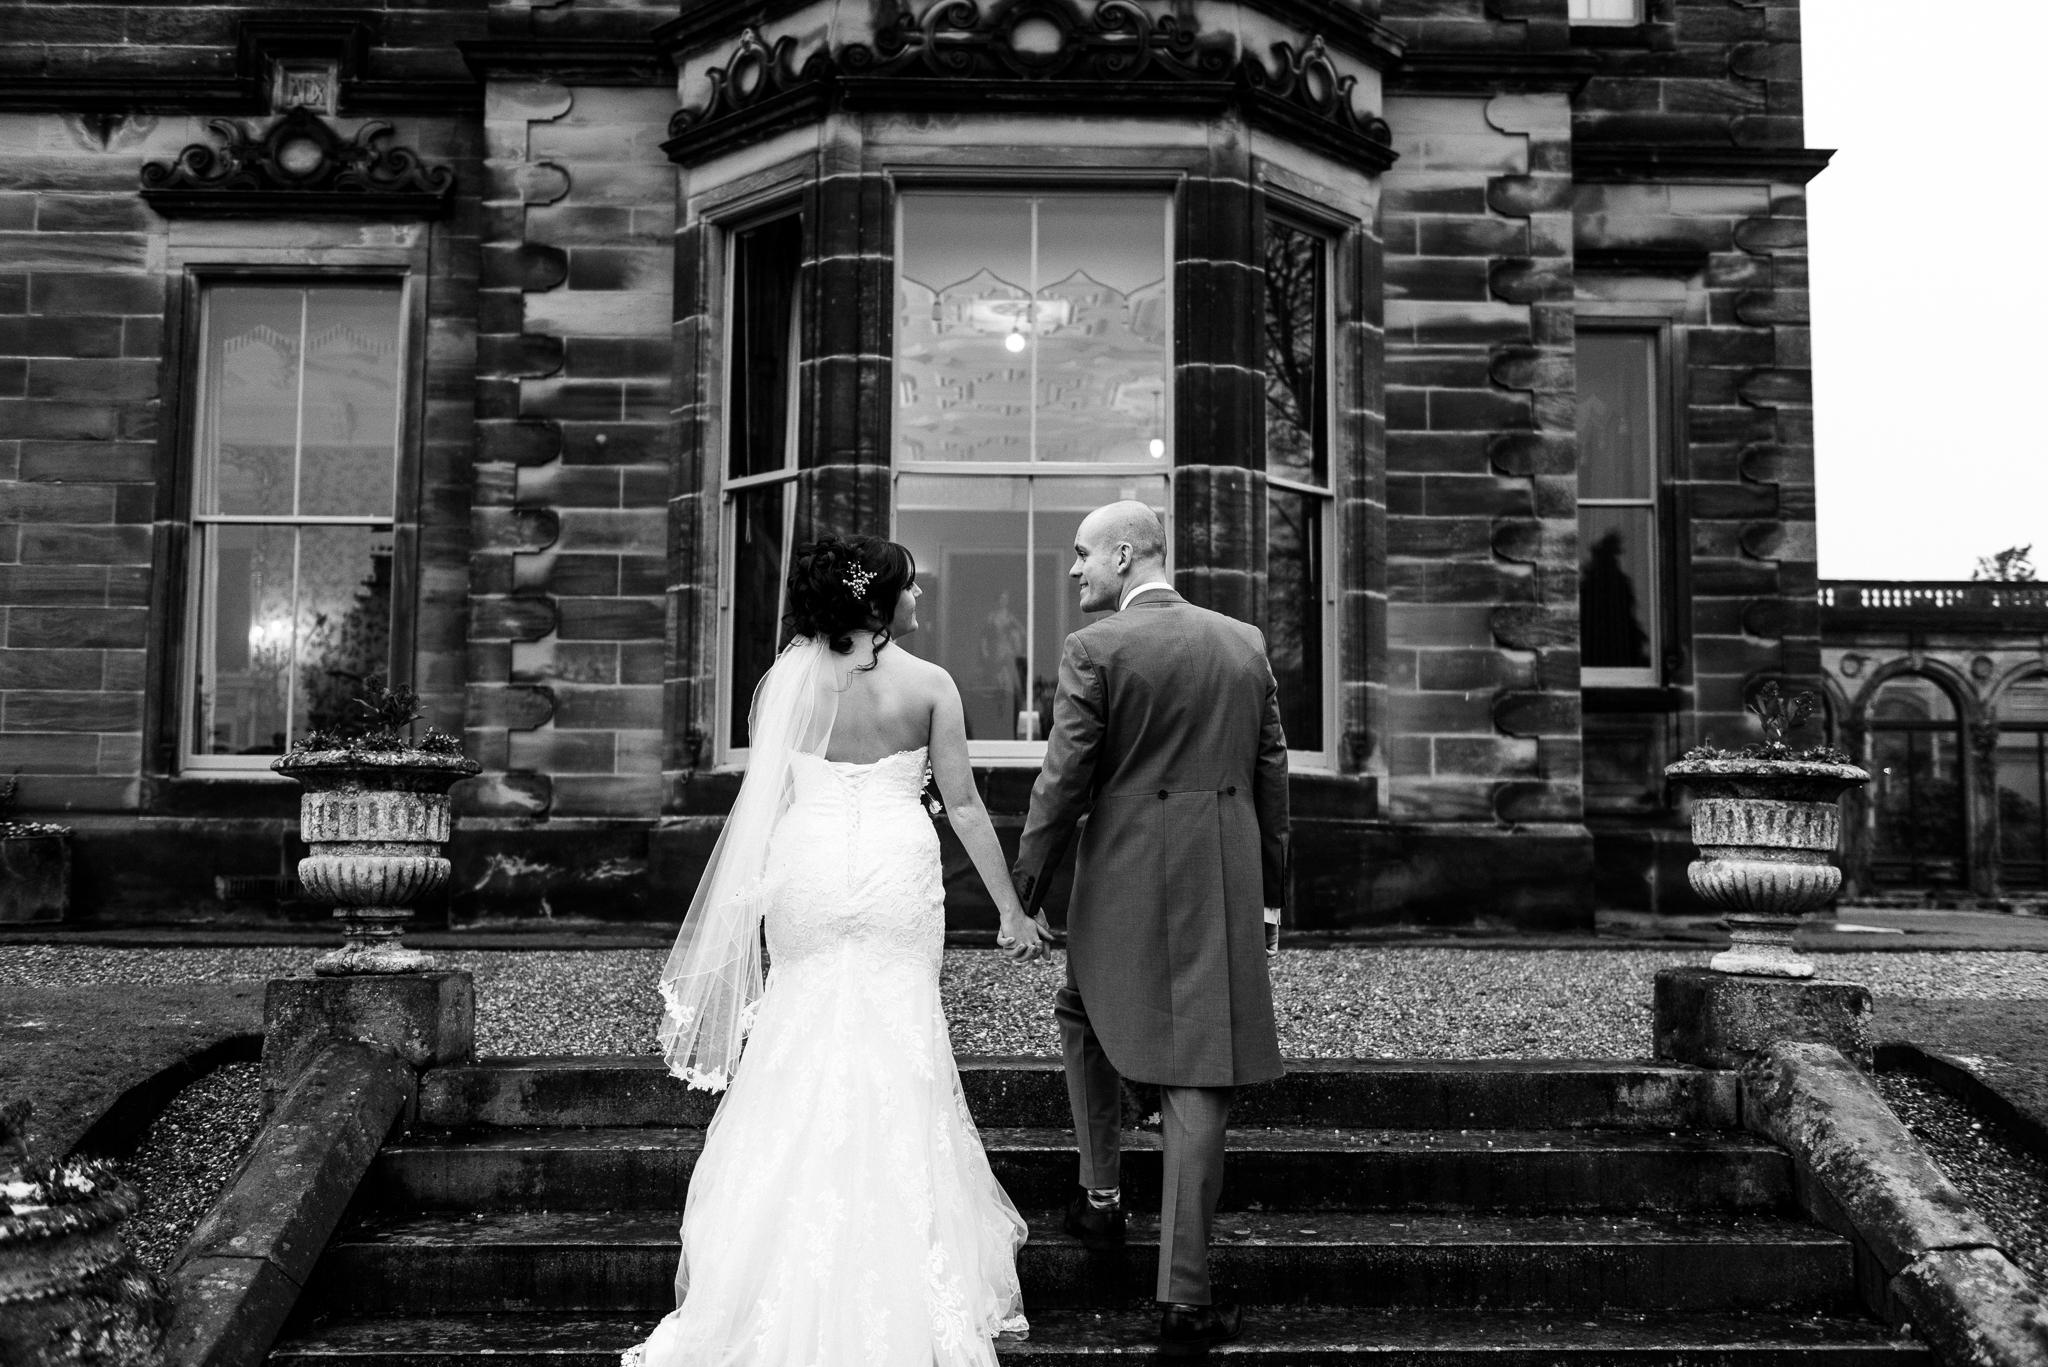 Snow Winter Wedding at Sandon Hall, Staffordshire - Jenny Harper-38.jpg